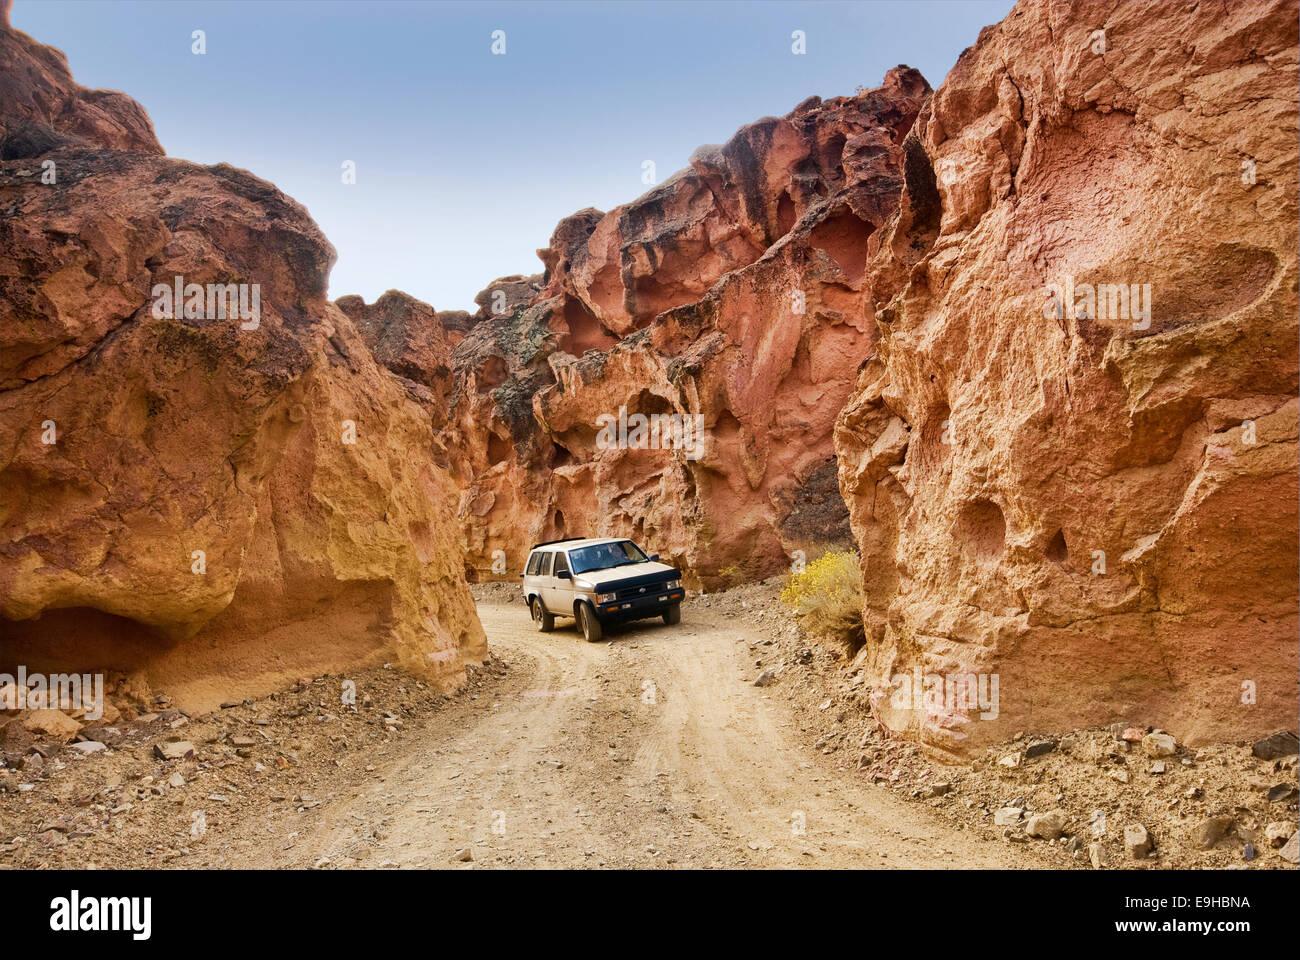 Road at Red Rock Canyon, Mojave Desert, north of Bishop, California, USA - Stock Image